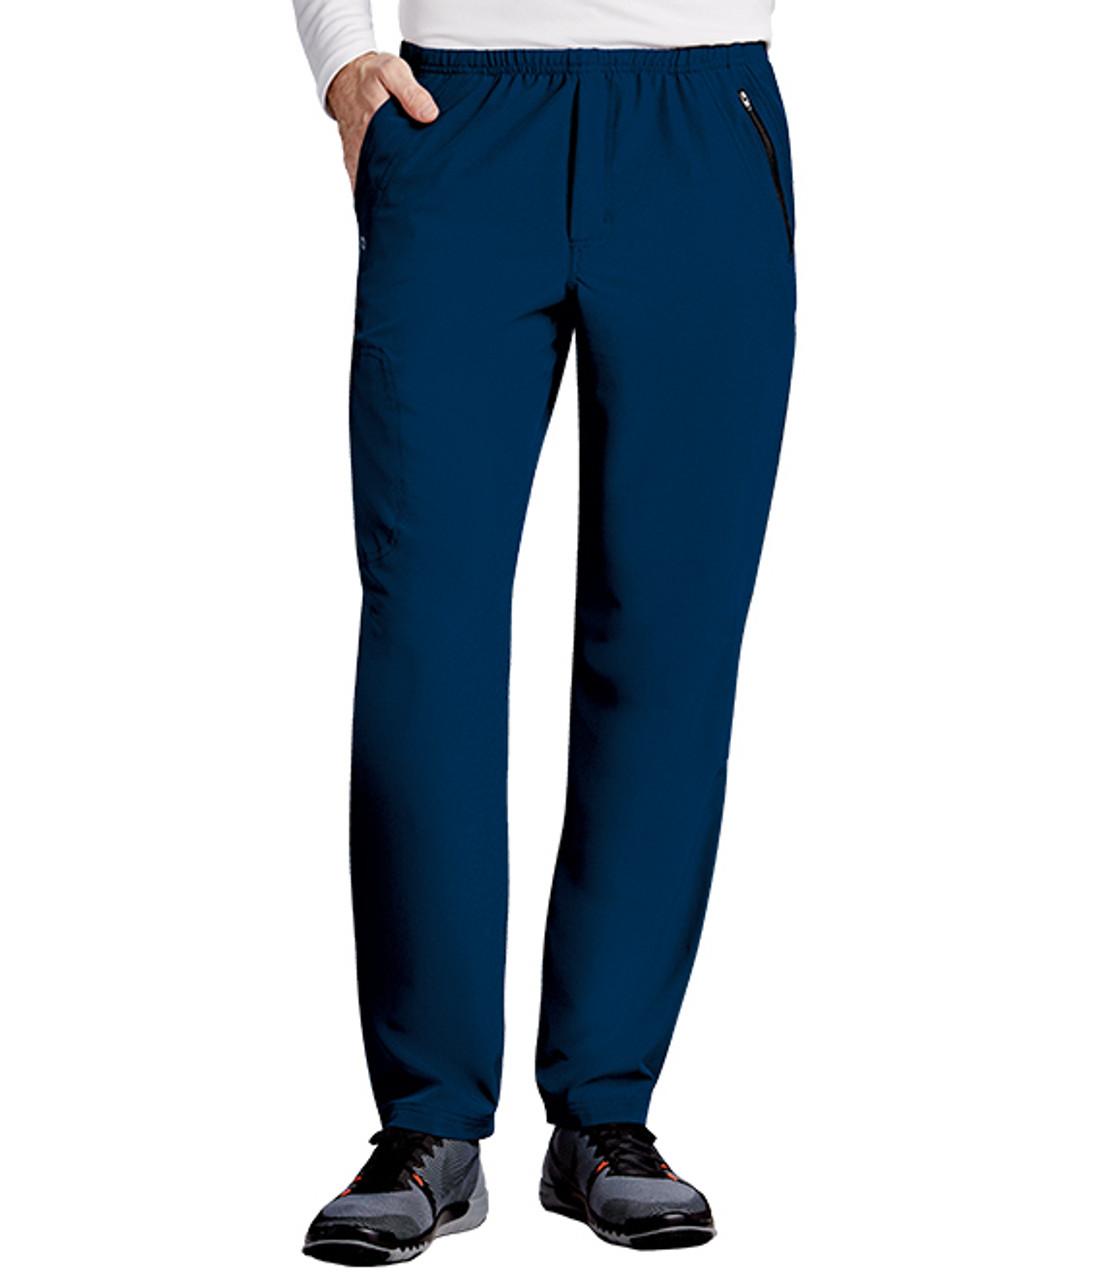 (0217S) Barco One Scrubs - Men's 7-Pocket Cargo Style Scrub Pant (Short)